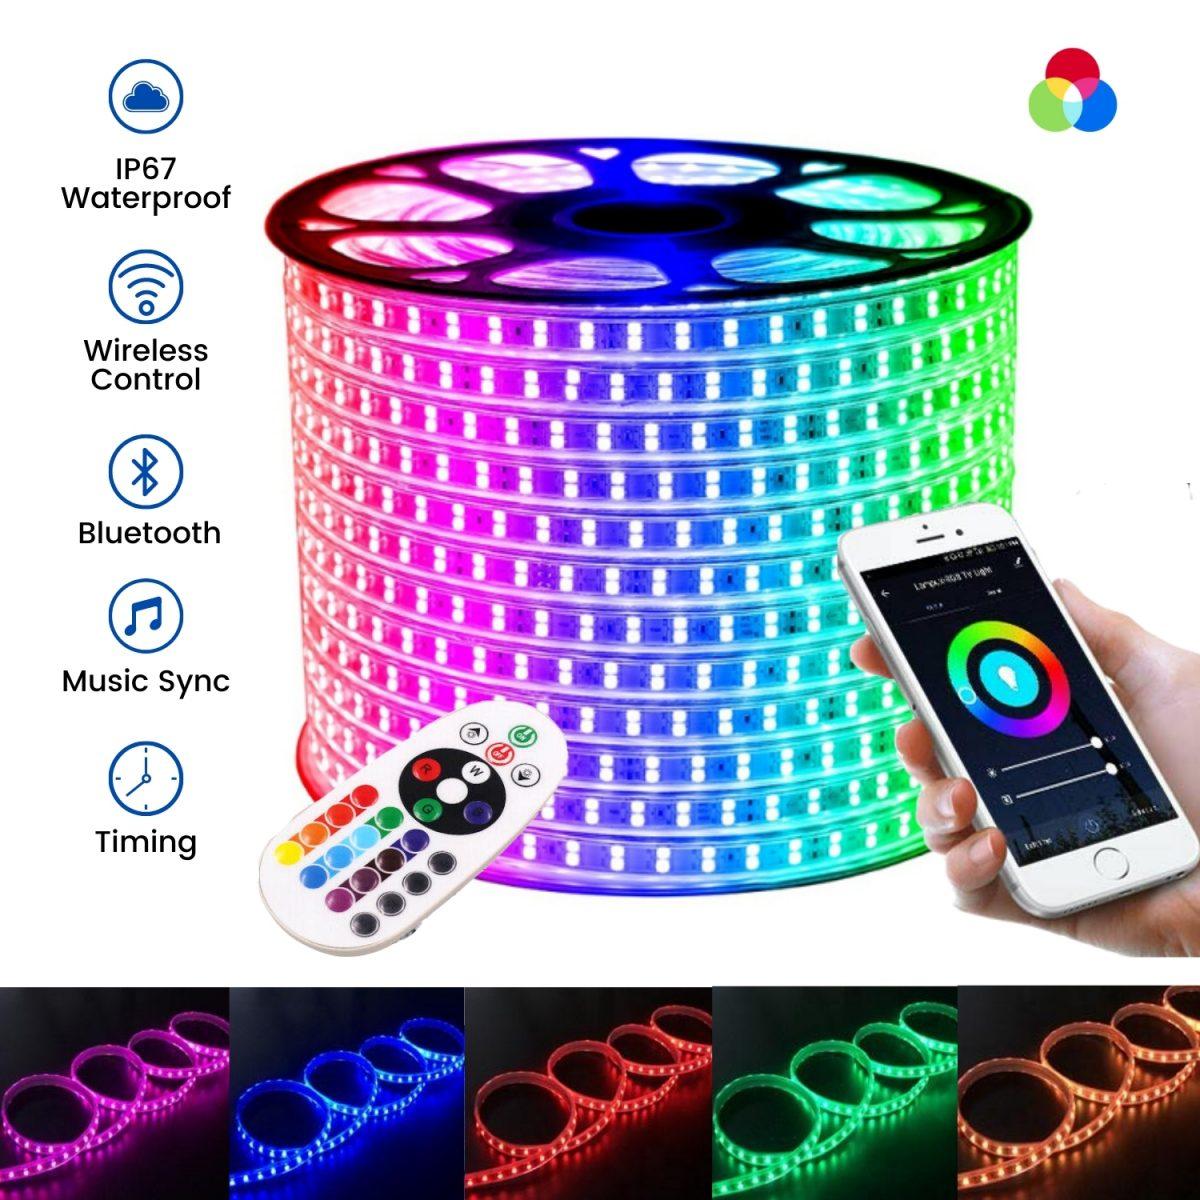 ATOM LED RGB 144LED_m 3 Line LED STRIP 220V WITH WIRELESS BLUETOOTH CONTROLLER & APP (1)